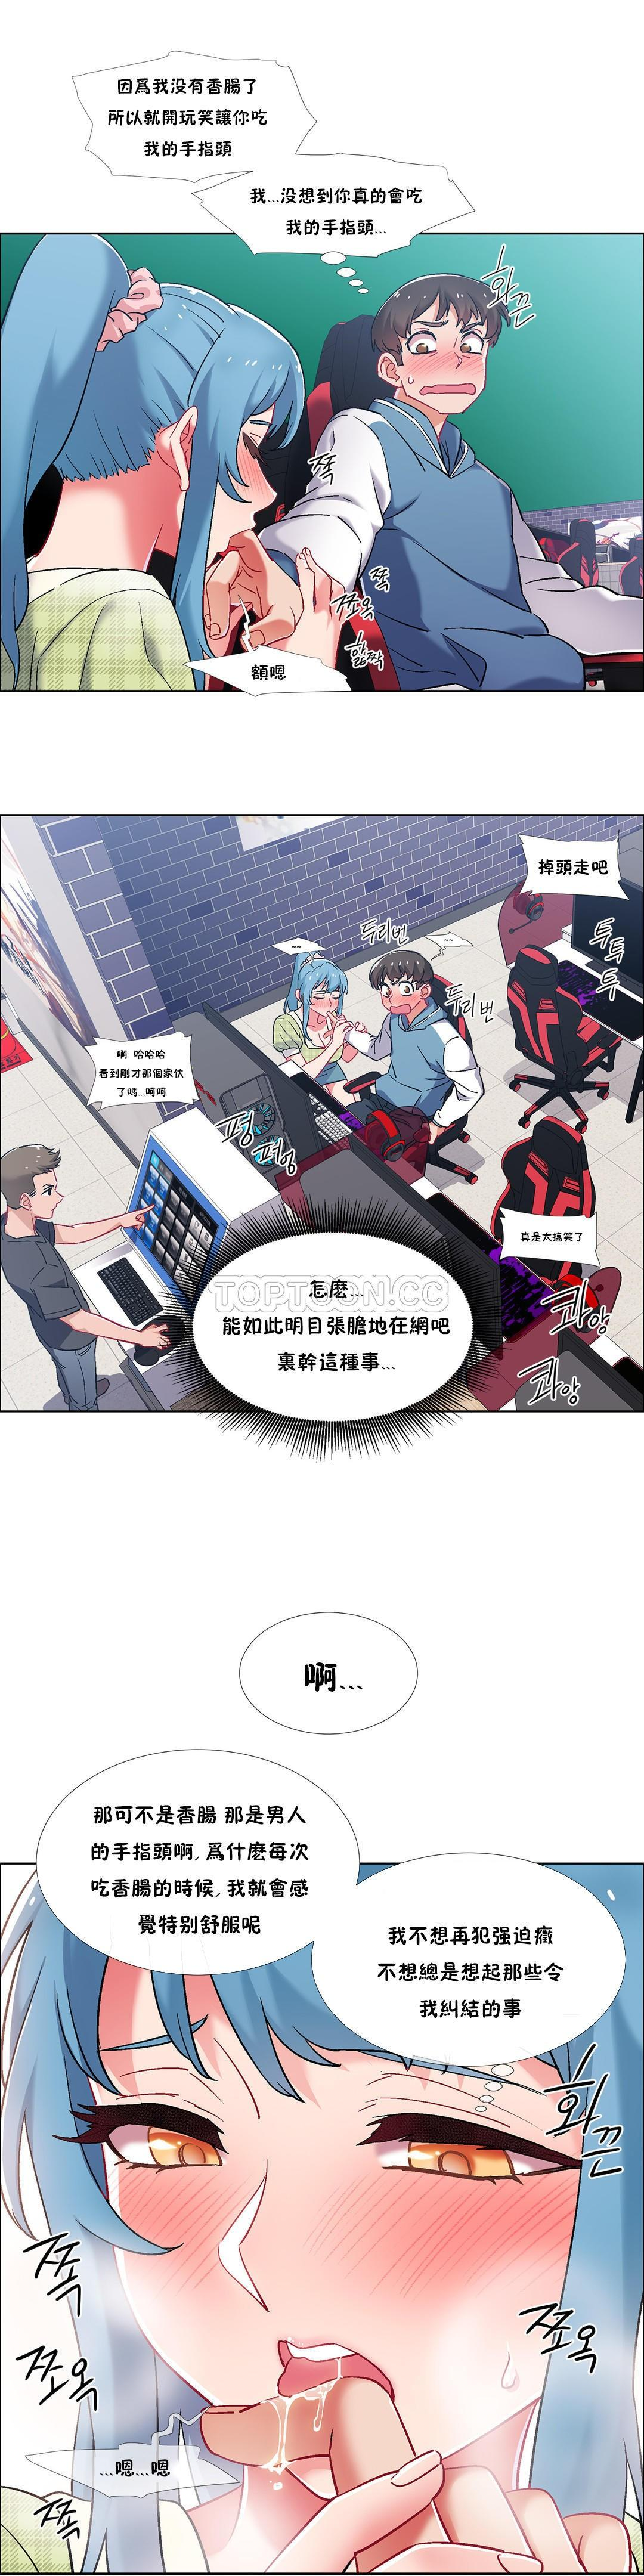 [Studio Wannabe] Rental Girls | 出租女郎 Ch. 33-58 [Chinese]  第二季 完结 93